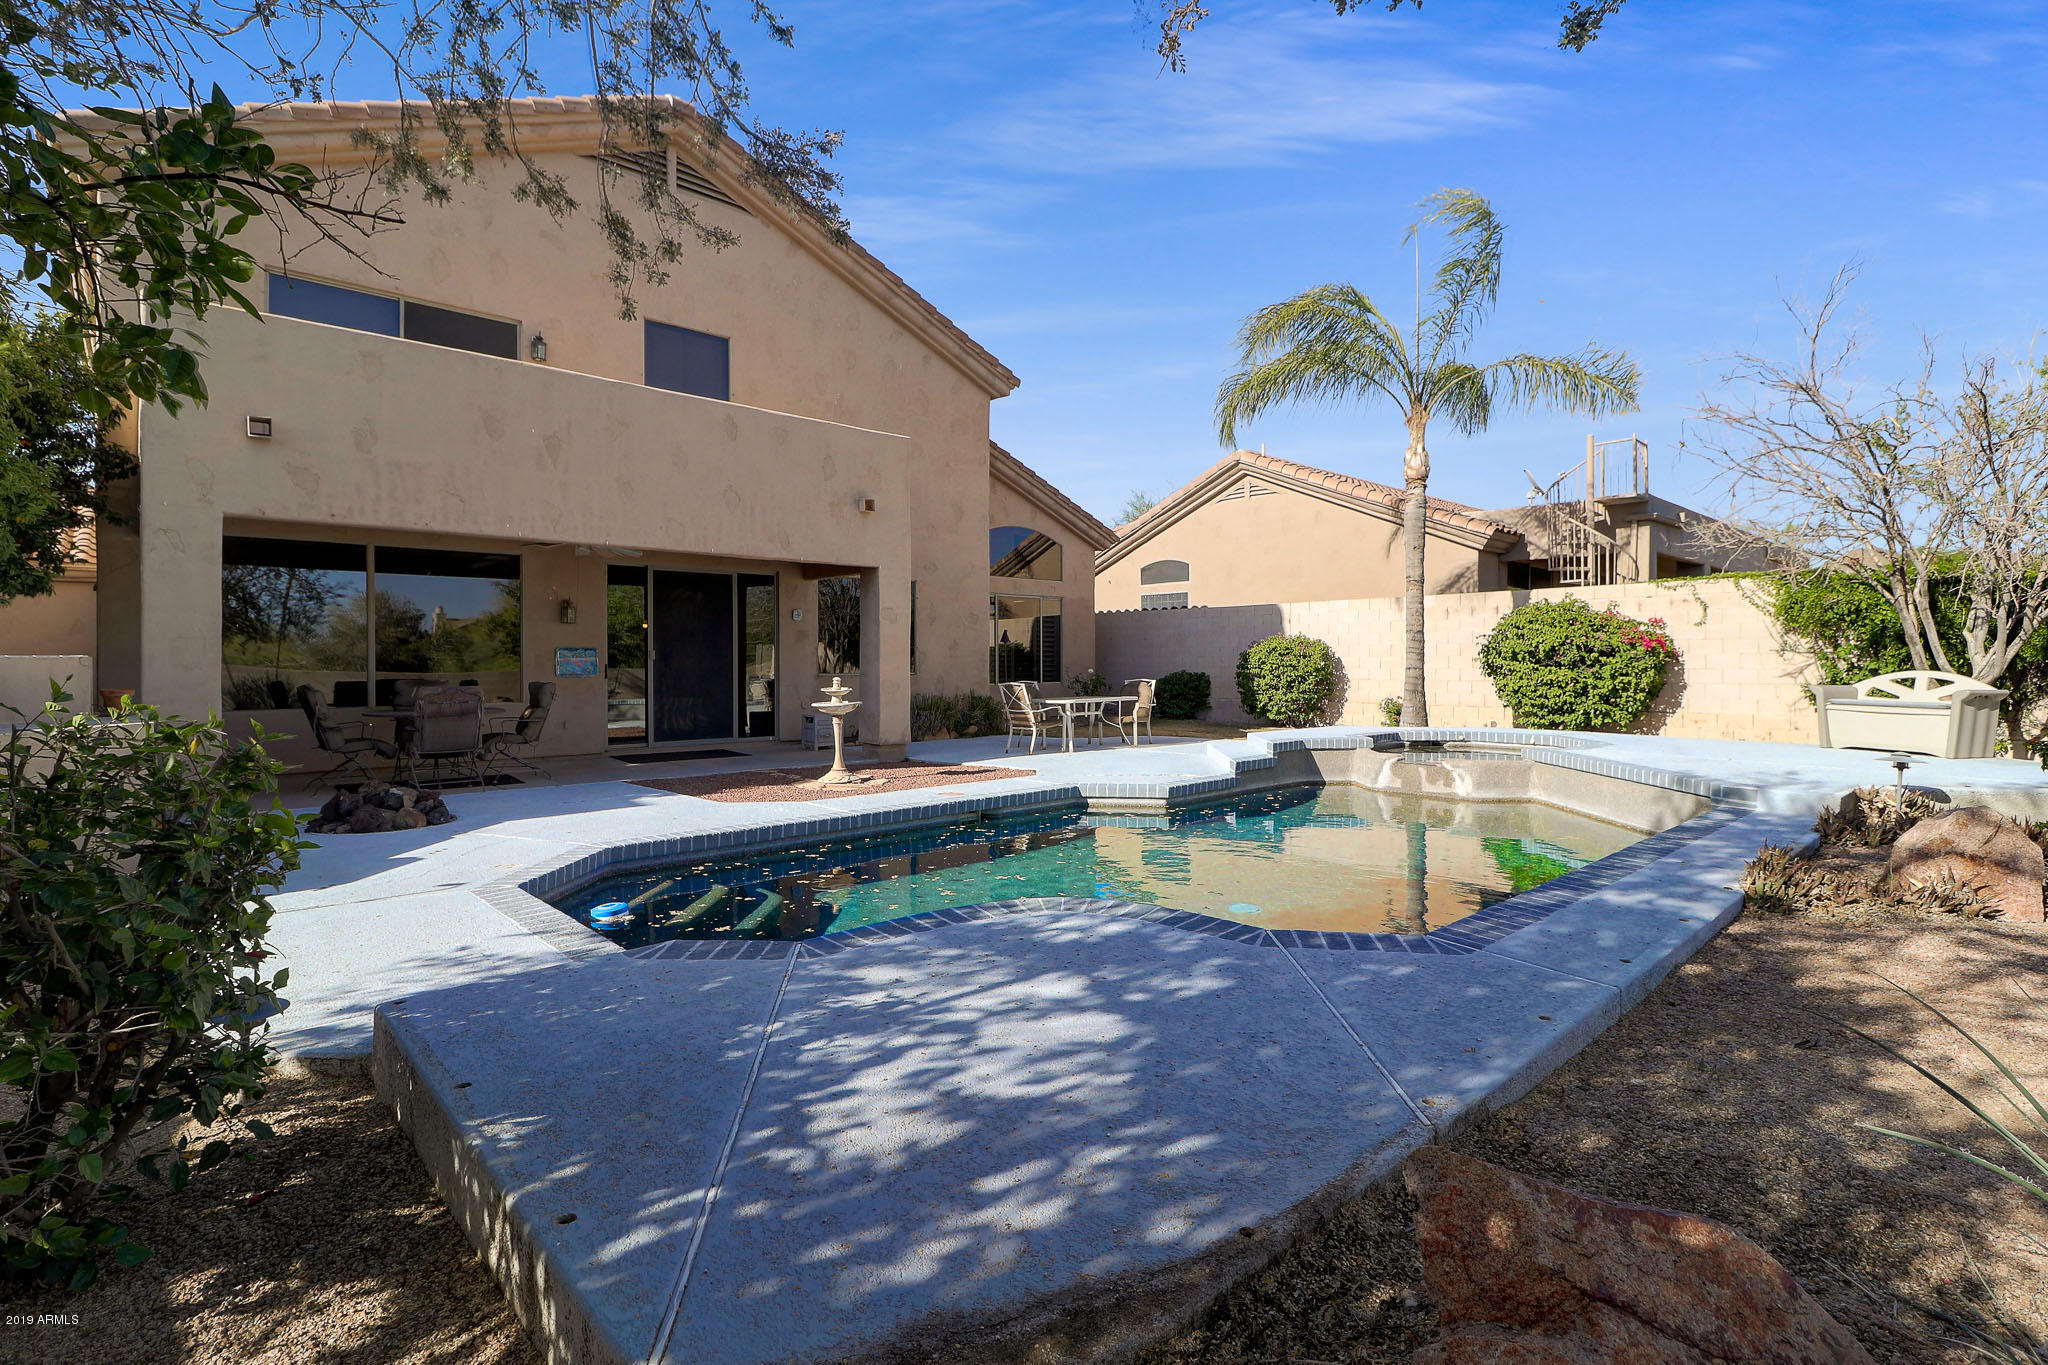 MLS 5938726 9039 E PARAISO Drive, Scottsdale, AZ 85255 Scottsdale AZ Private Pool